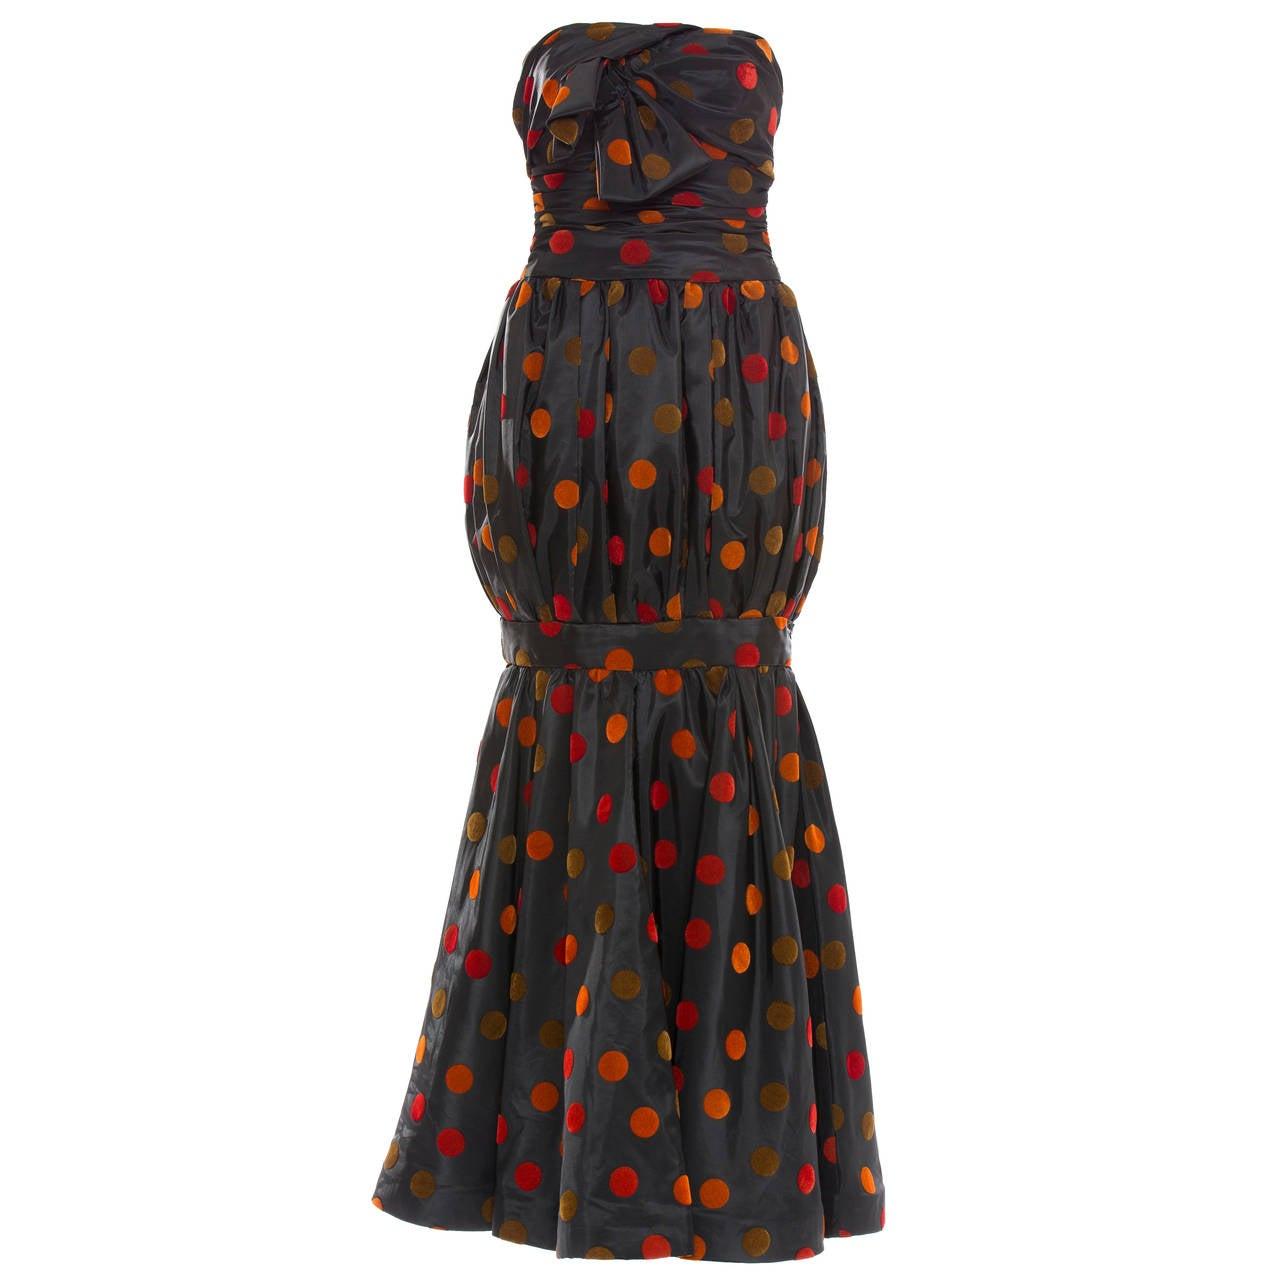 Nina Ricci Strapless Silk Taffeta Evening Dress, Circa 1980s